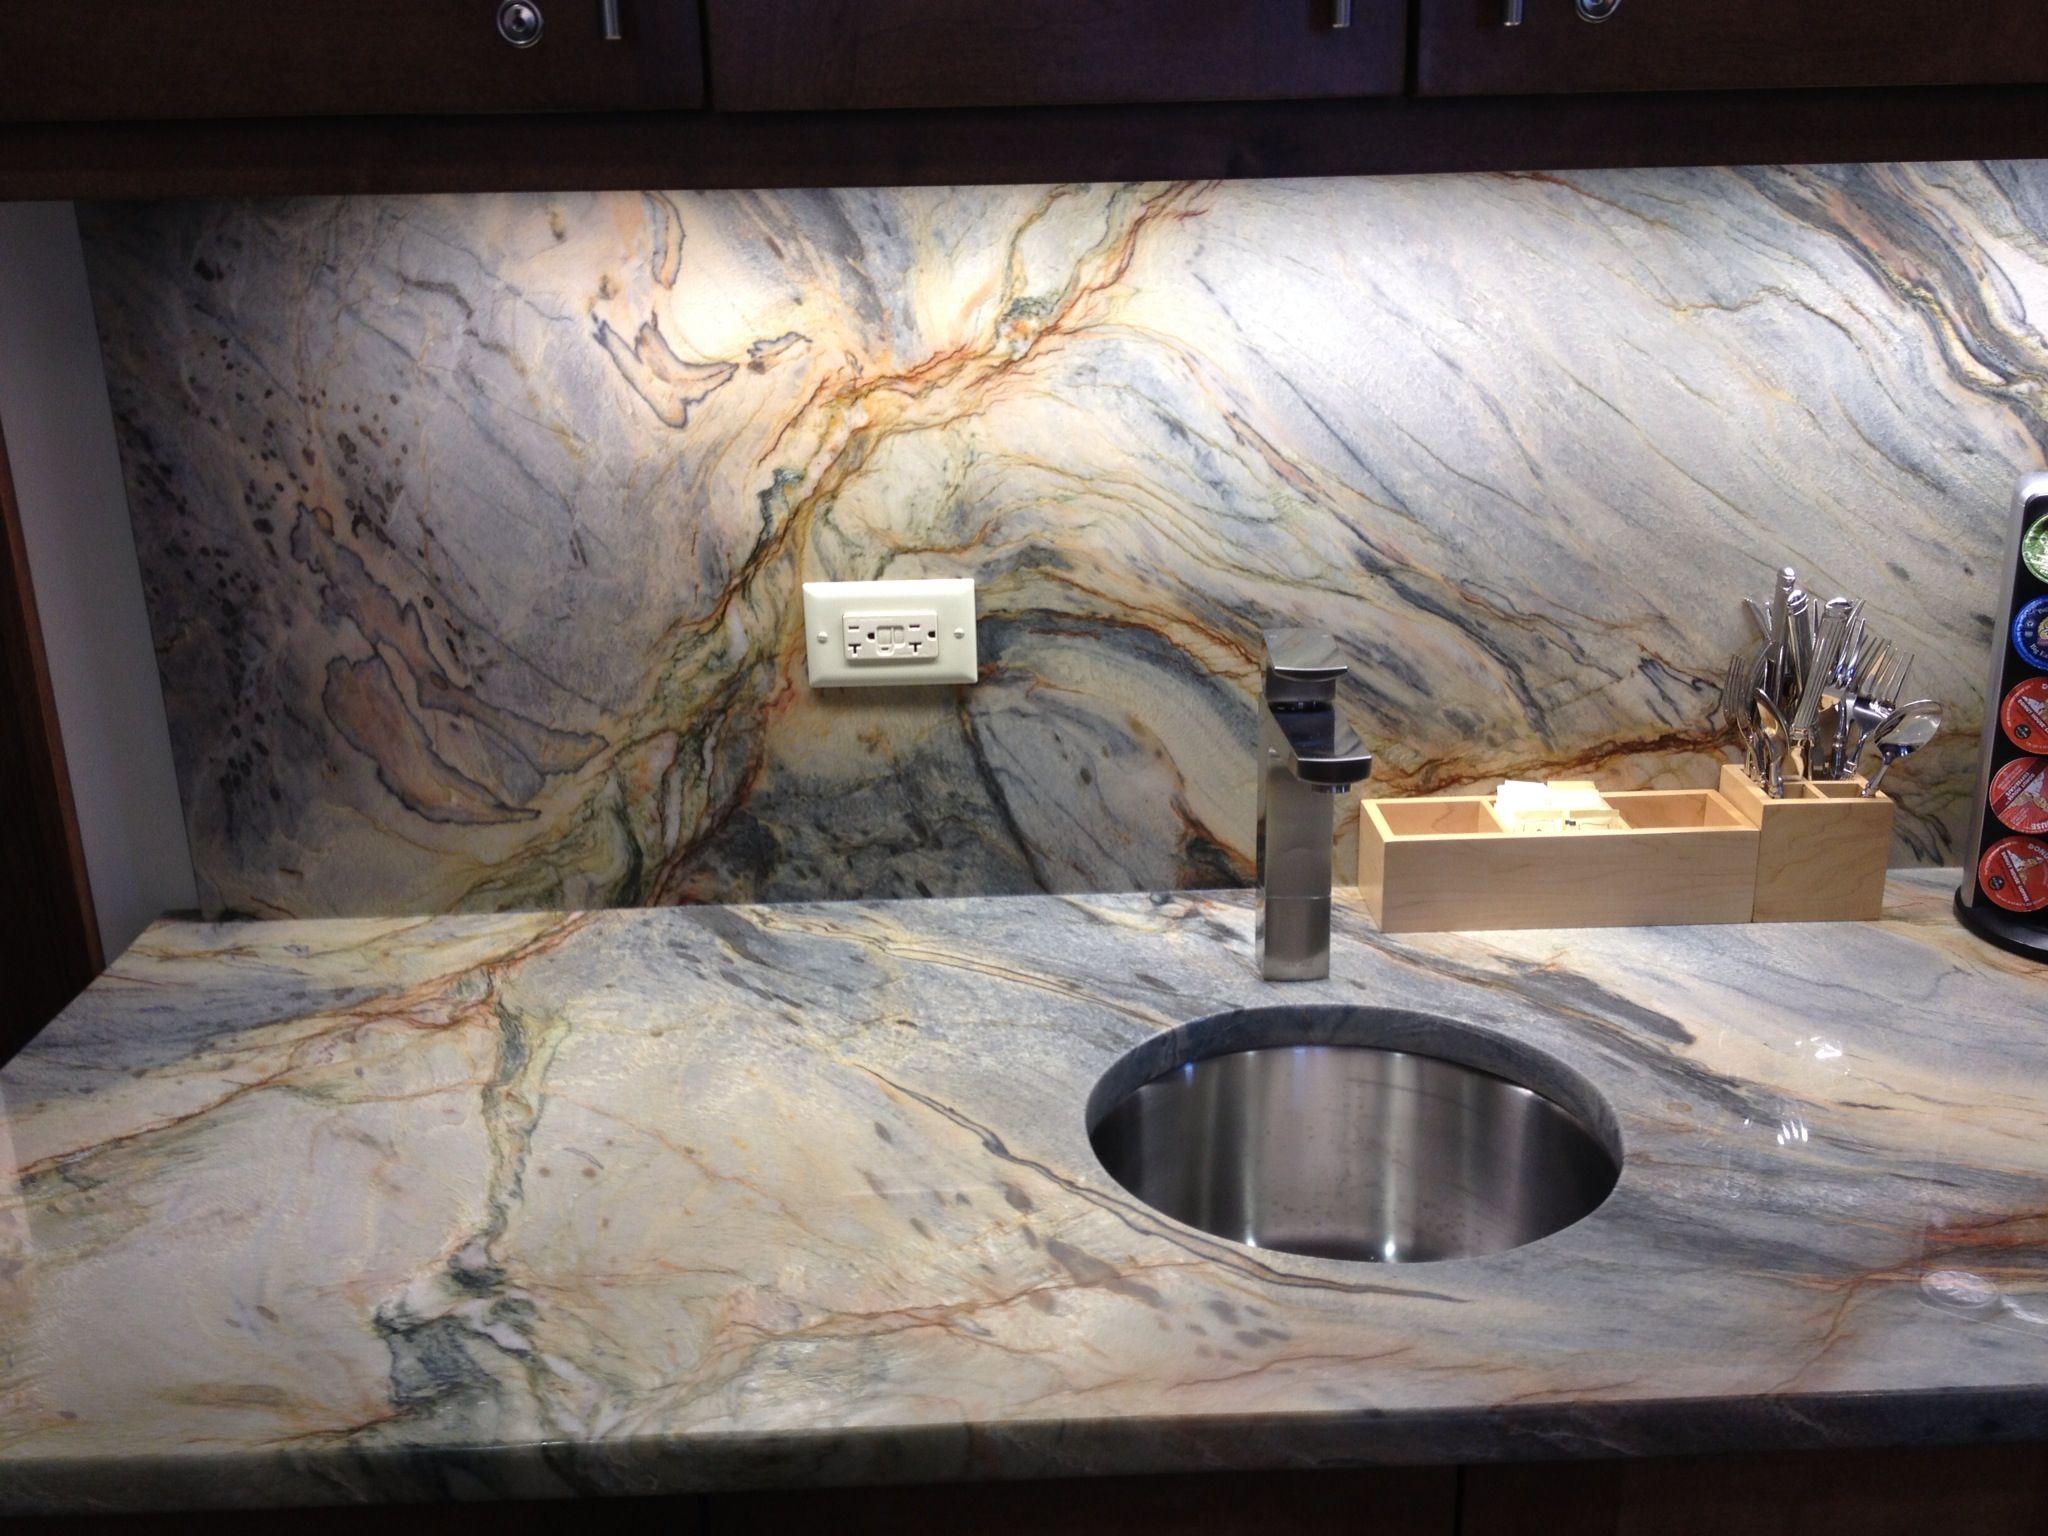 Fusion Granite Top Backsplash By